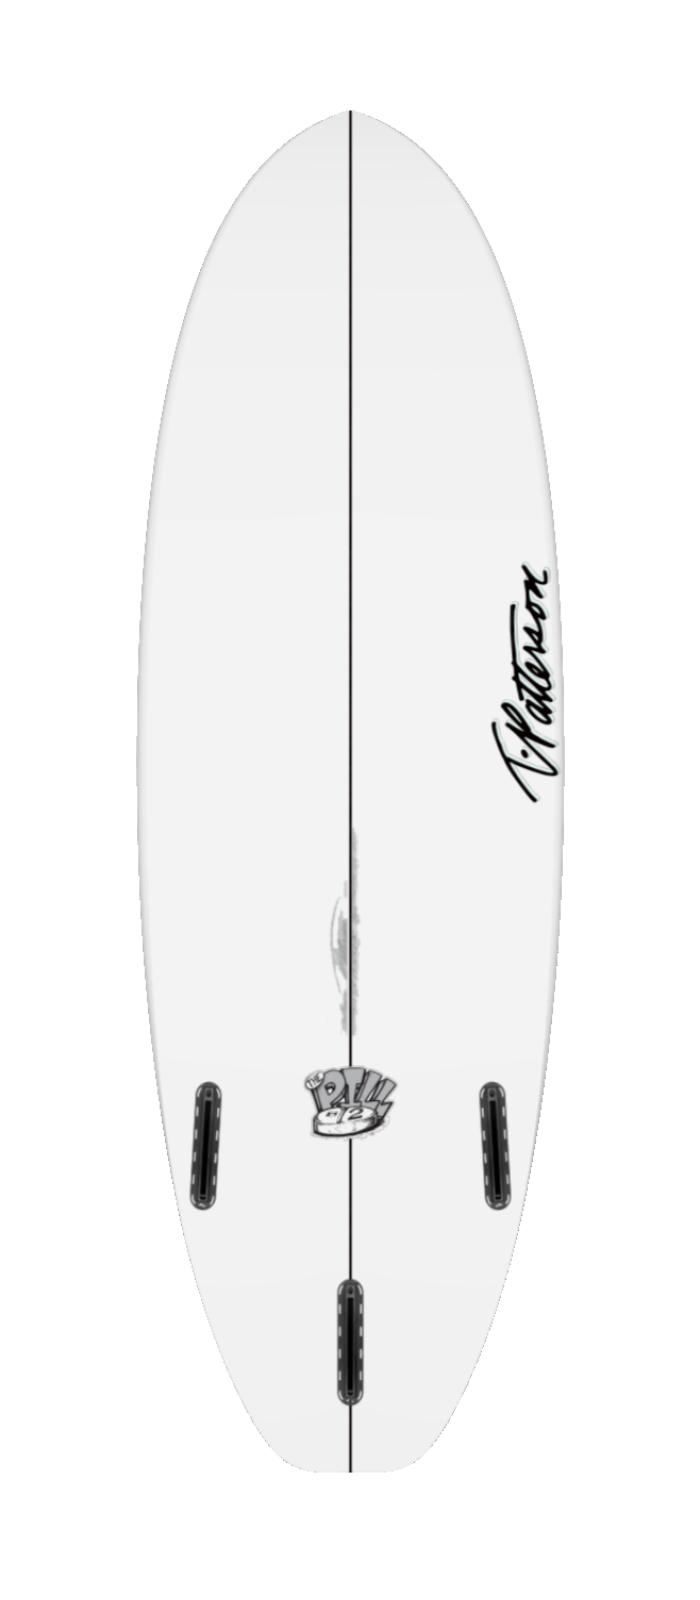 THE PILL TWO surfboard model bottom